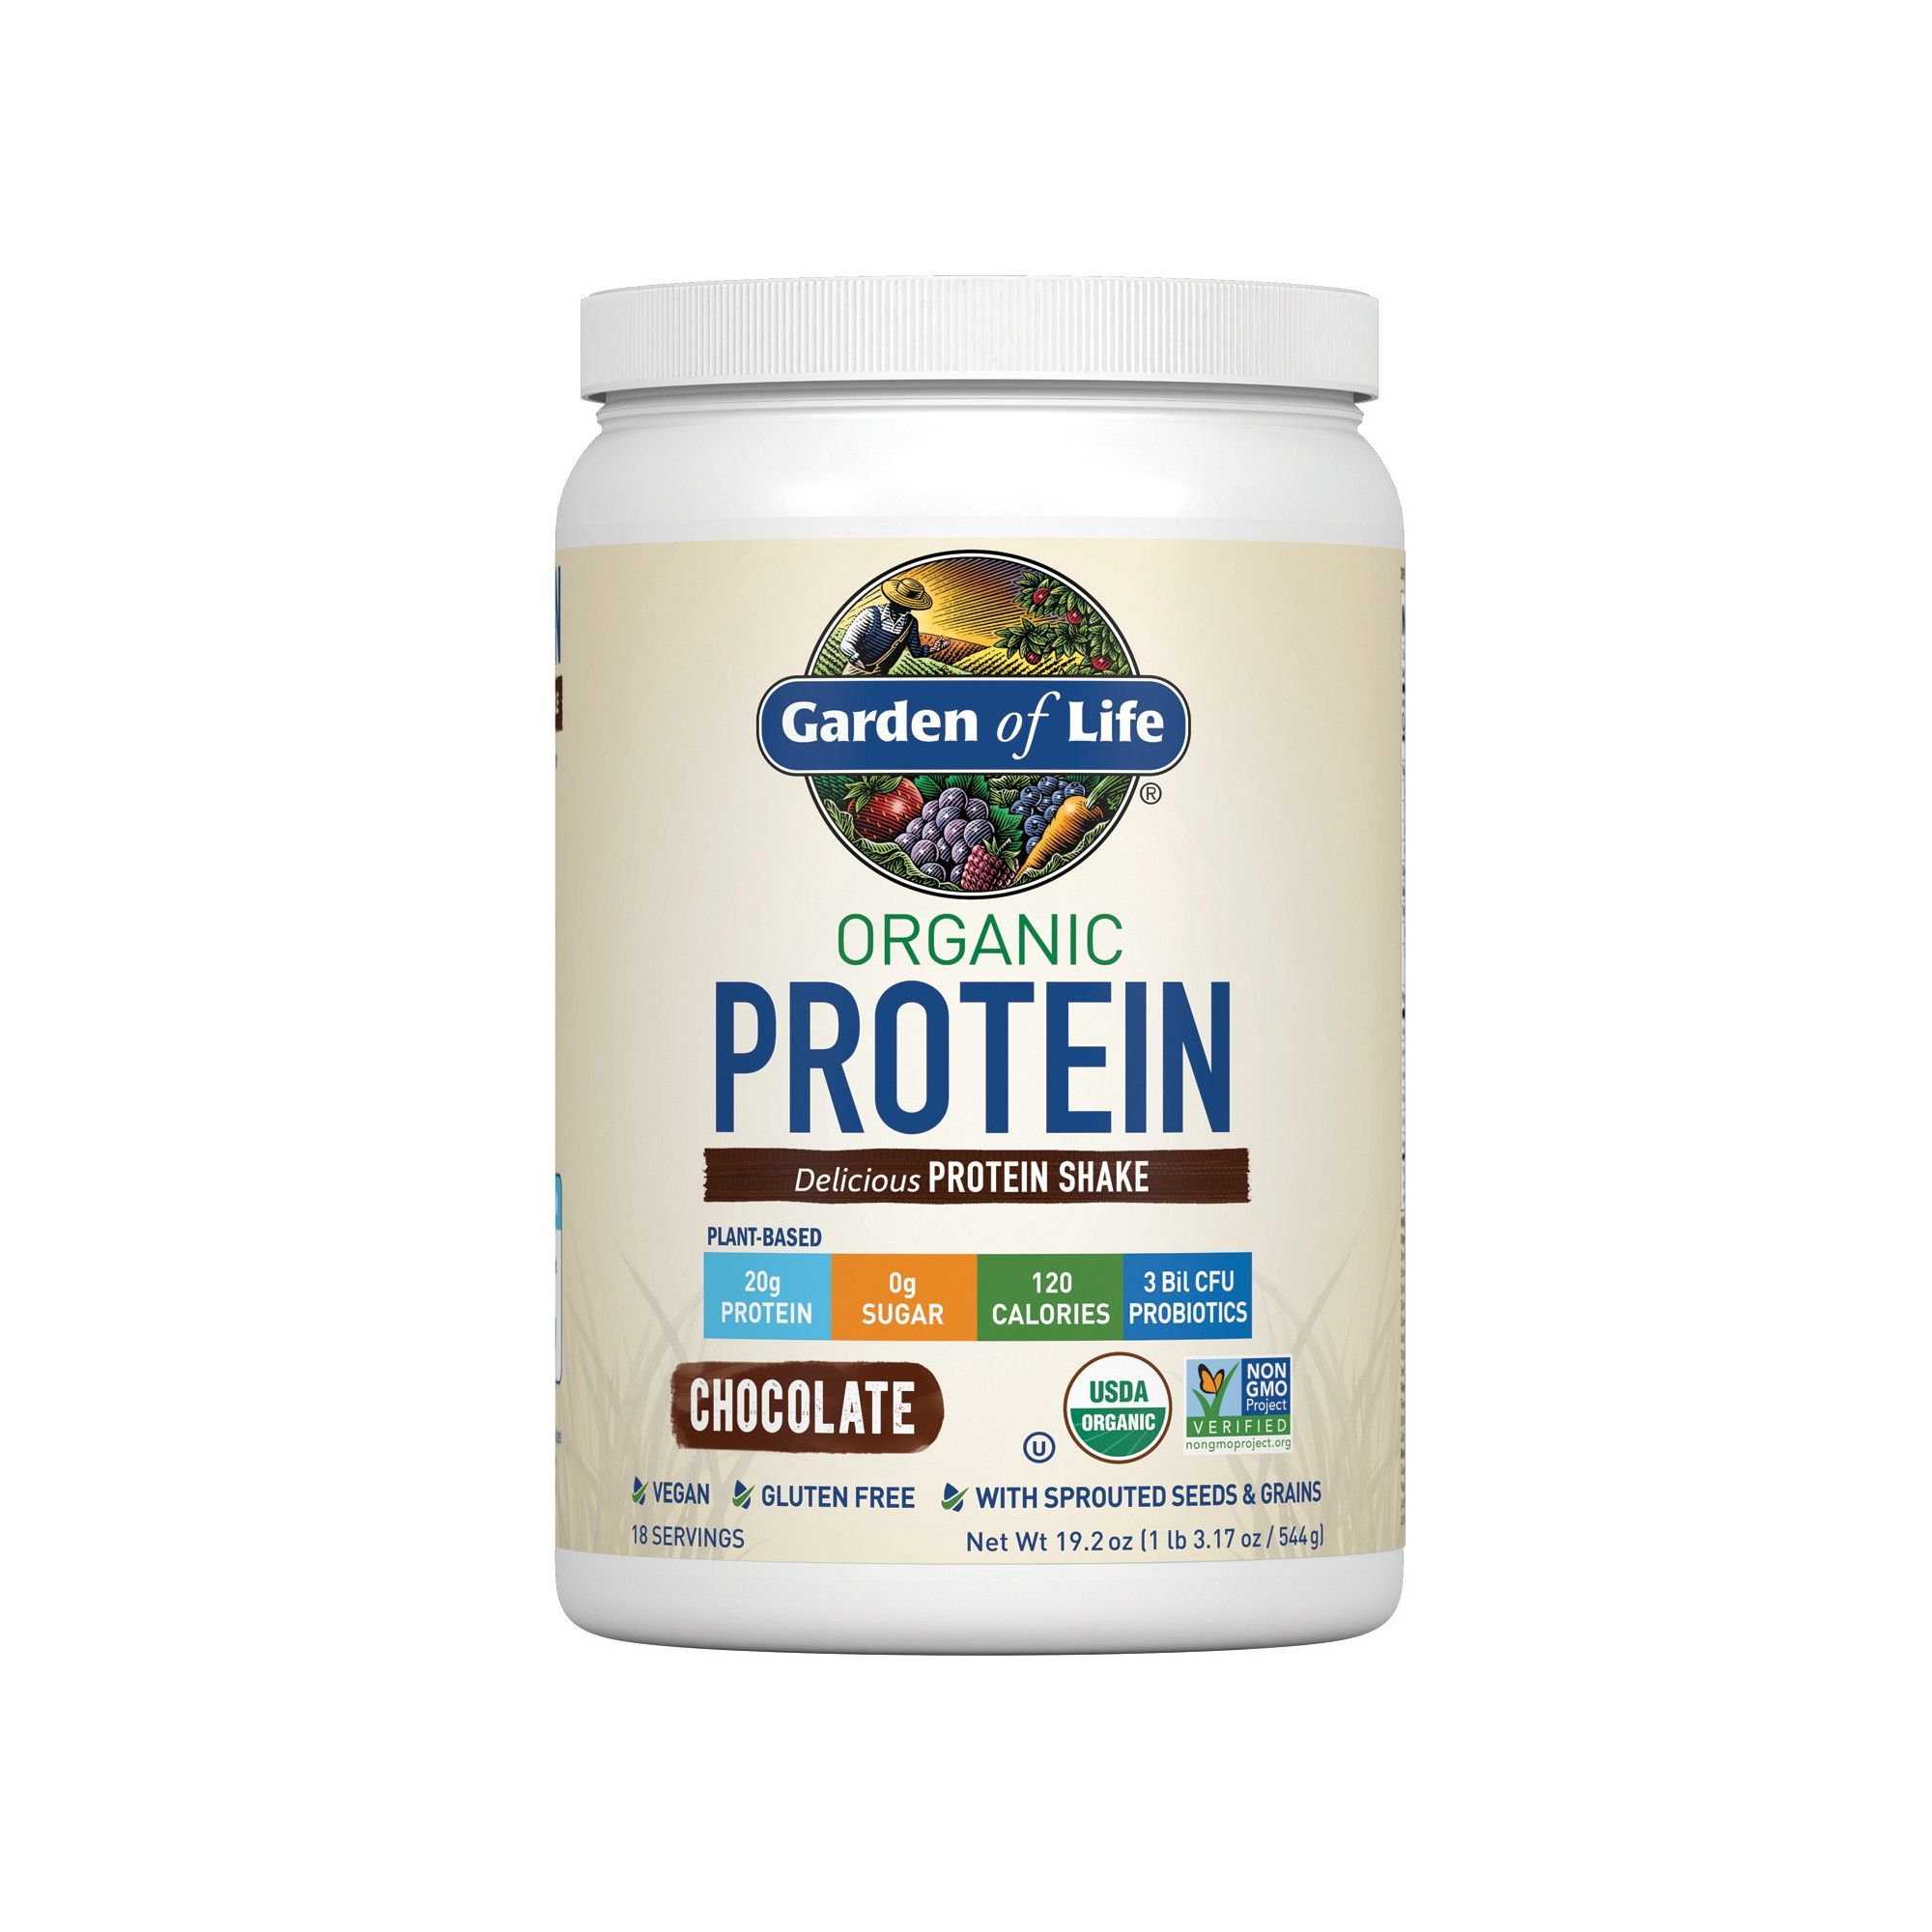 Nestlé's Garden of Life releases readytodrink protein